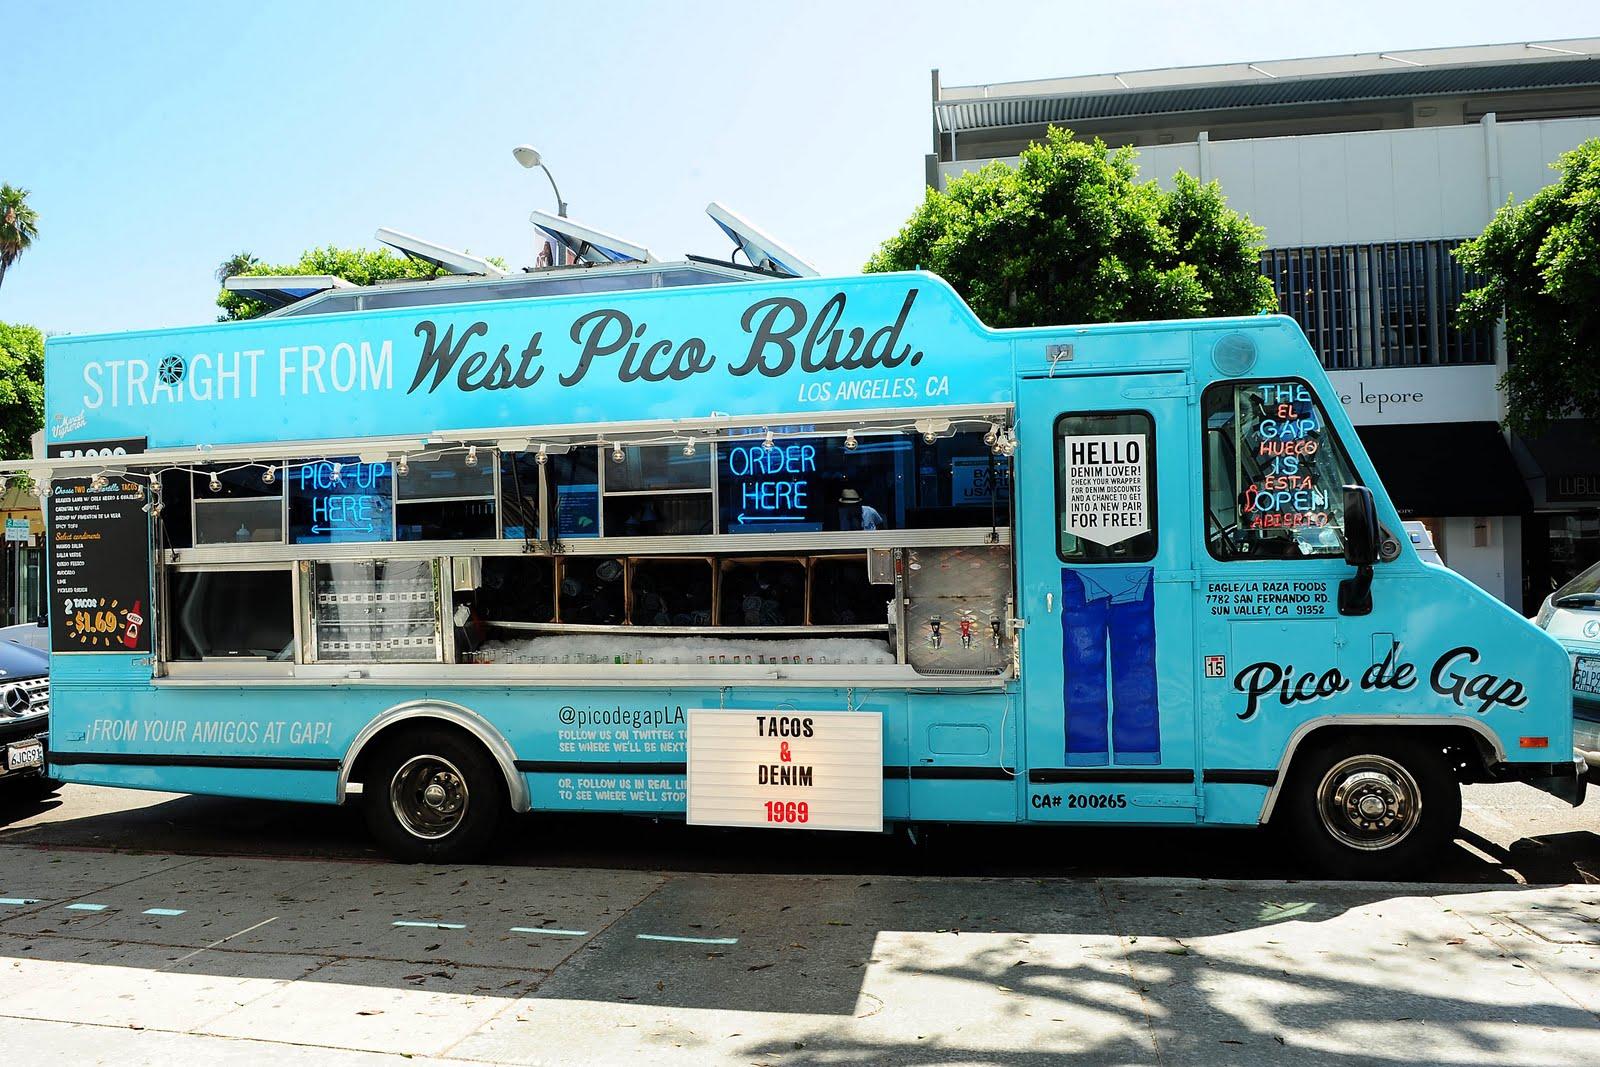 The Gap S Pico De Gap Truck Providing Food Fashion And